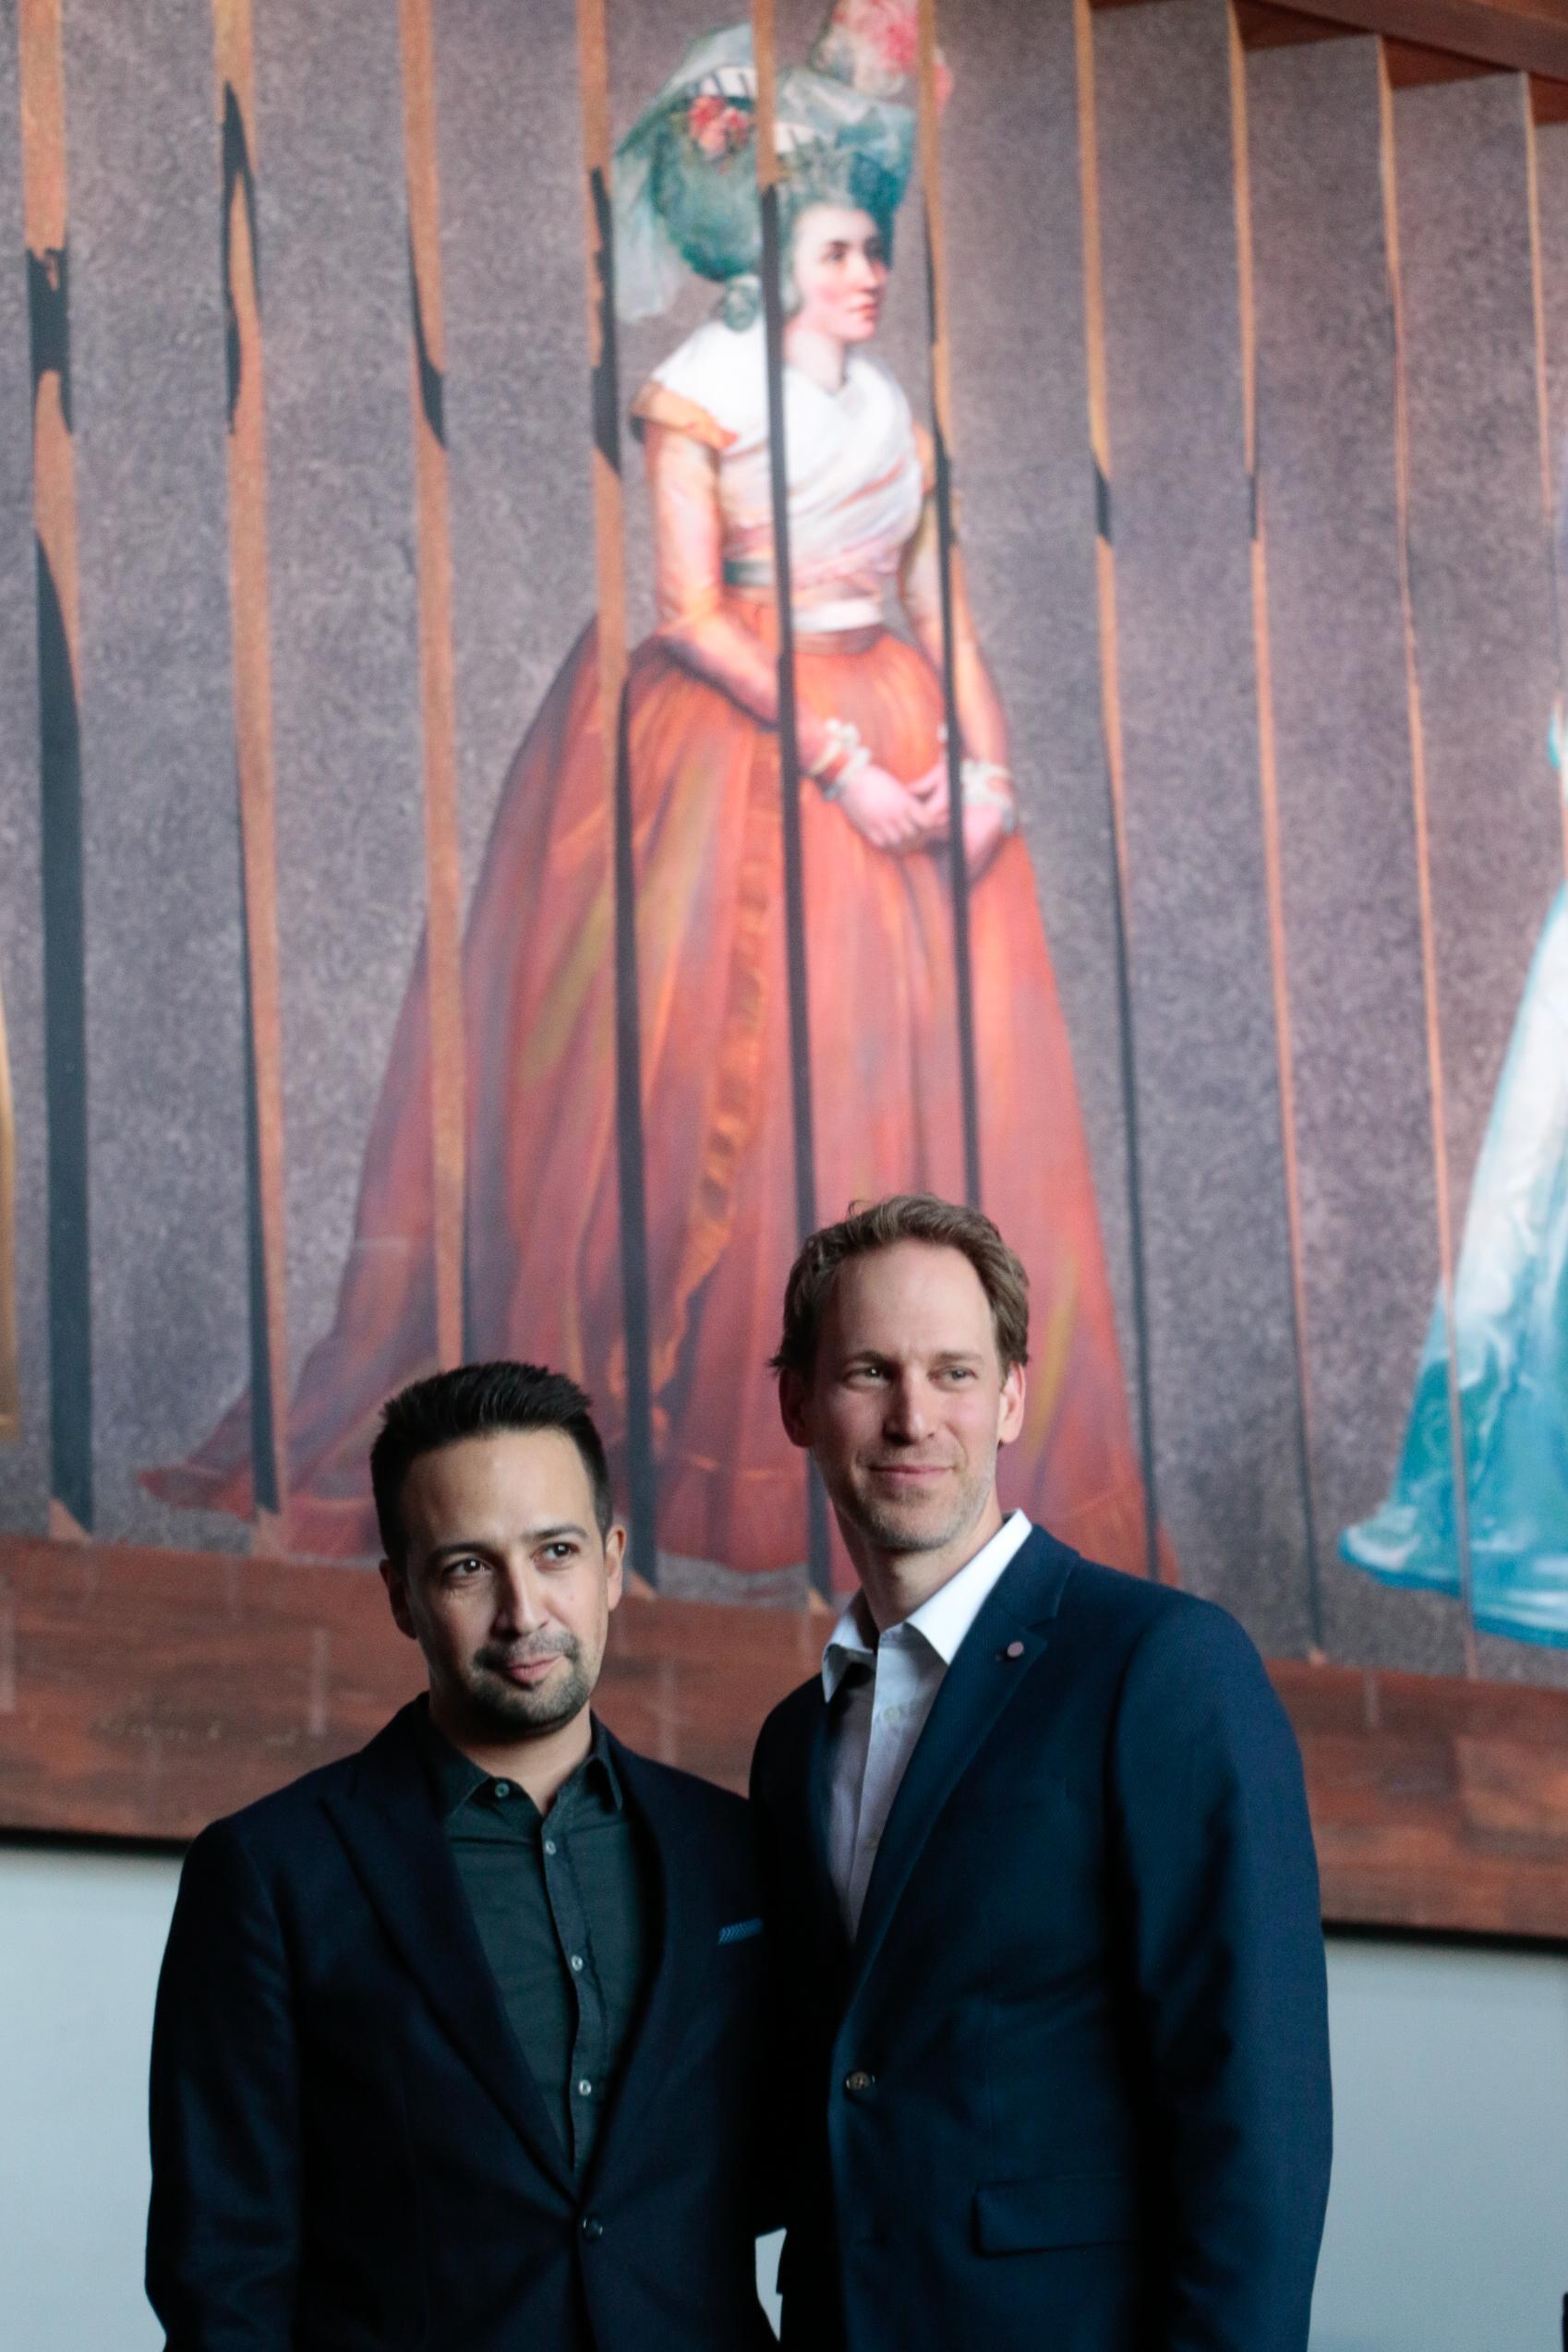 Lin Manuel Miranda and David Korins at the Hamilton Exhibition Press Conference, April 26th, 2019. Photo by Mary Crylen.